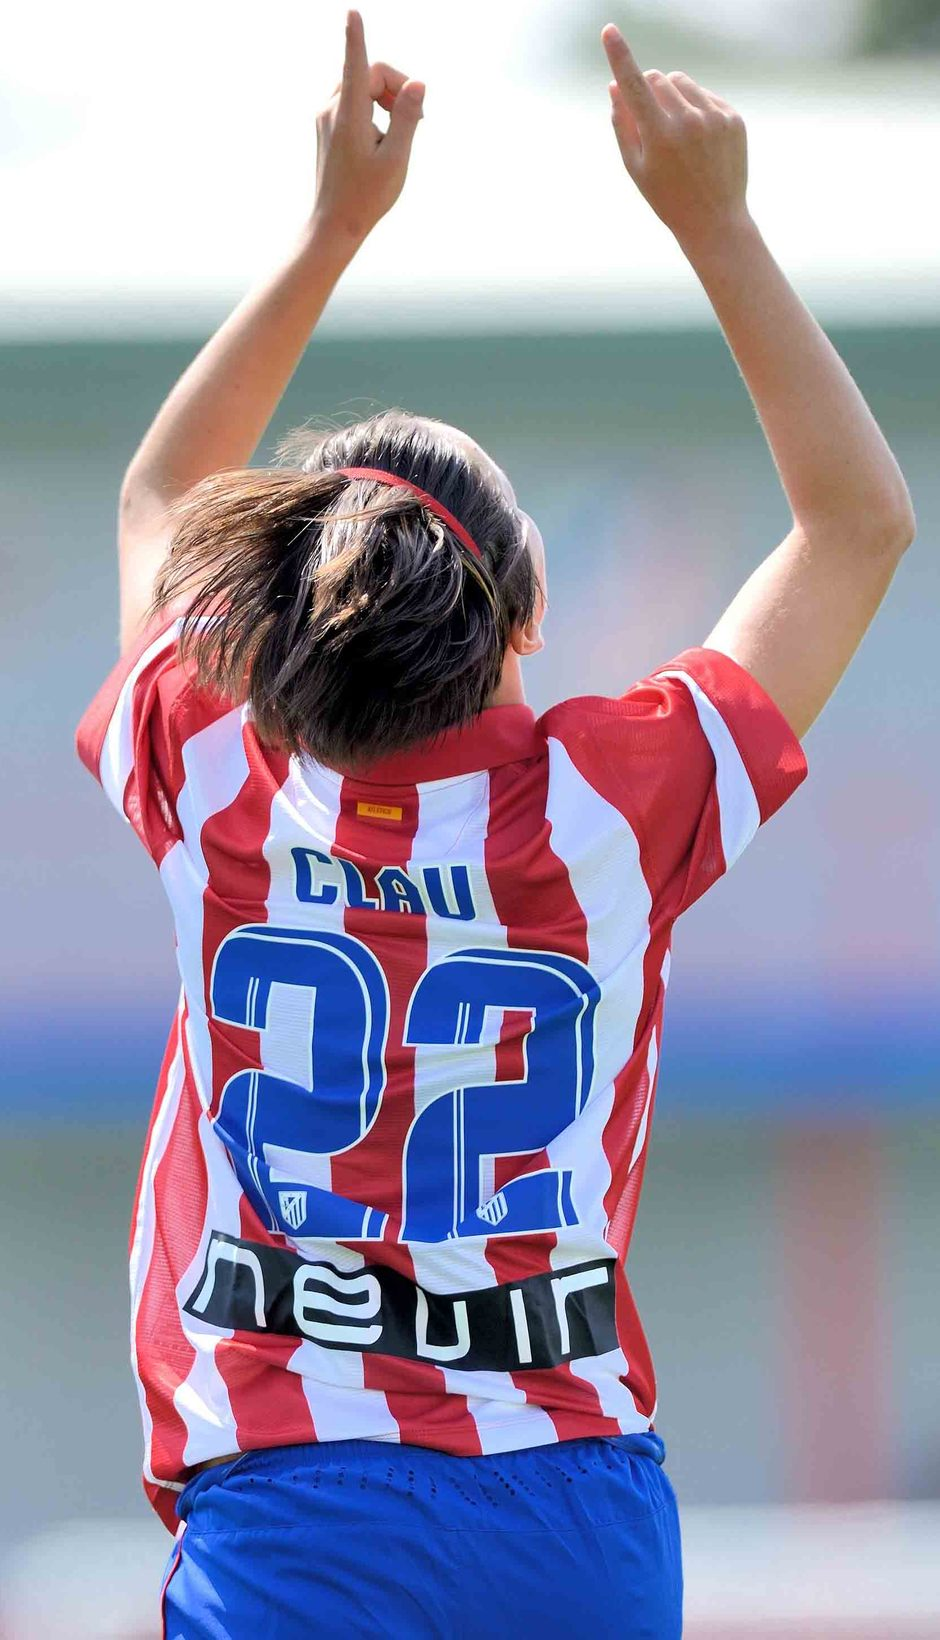 Temporada 2013-2014. Dedicatoria especial de Claudia Zornoza